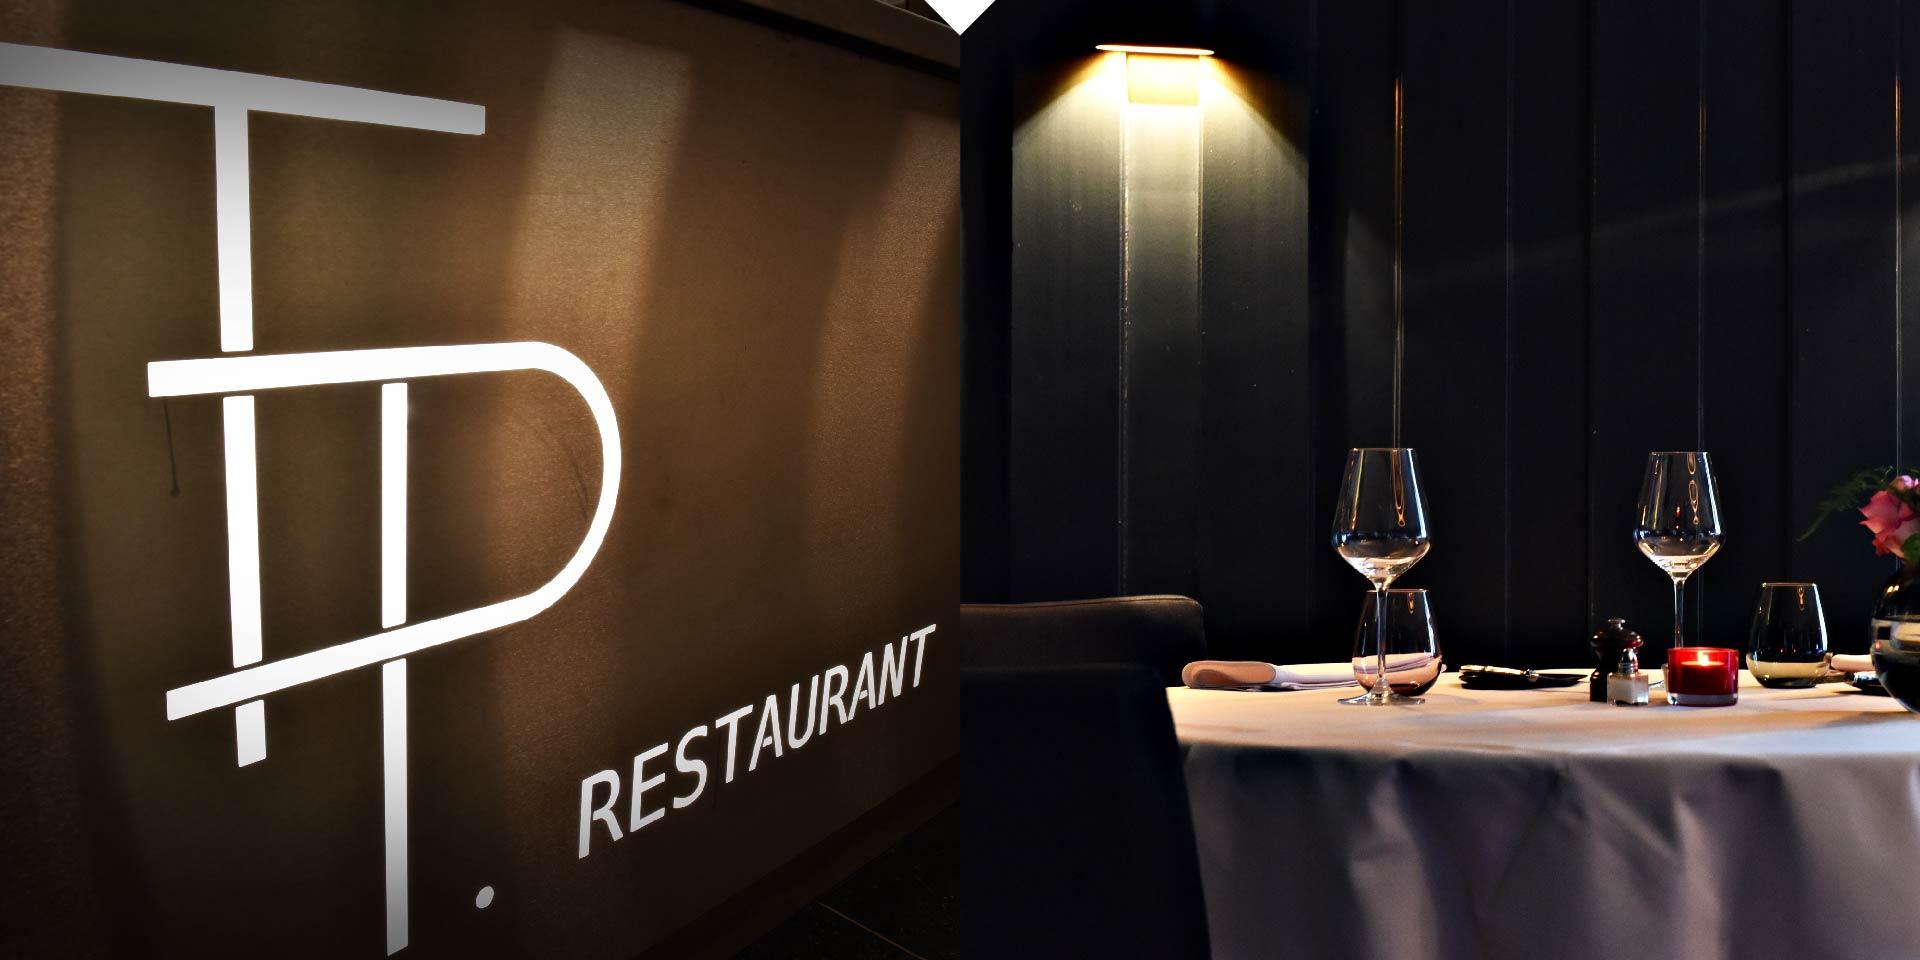 fotos-menu-restaurant_restaurant_tparksken